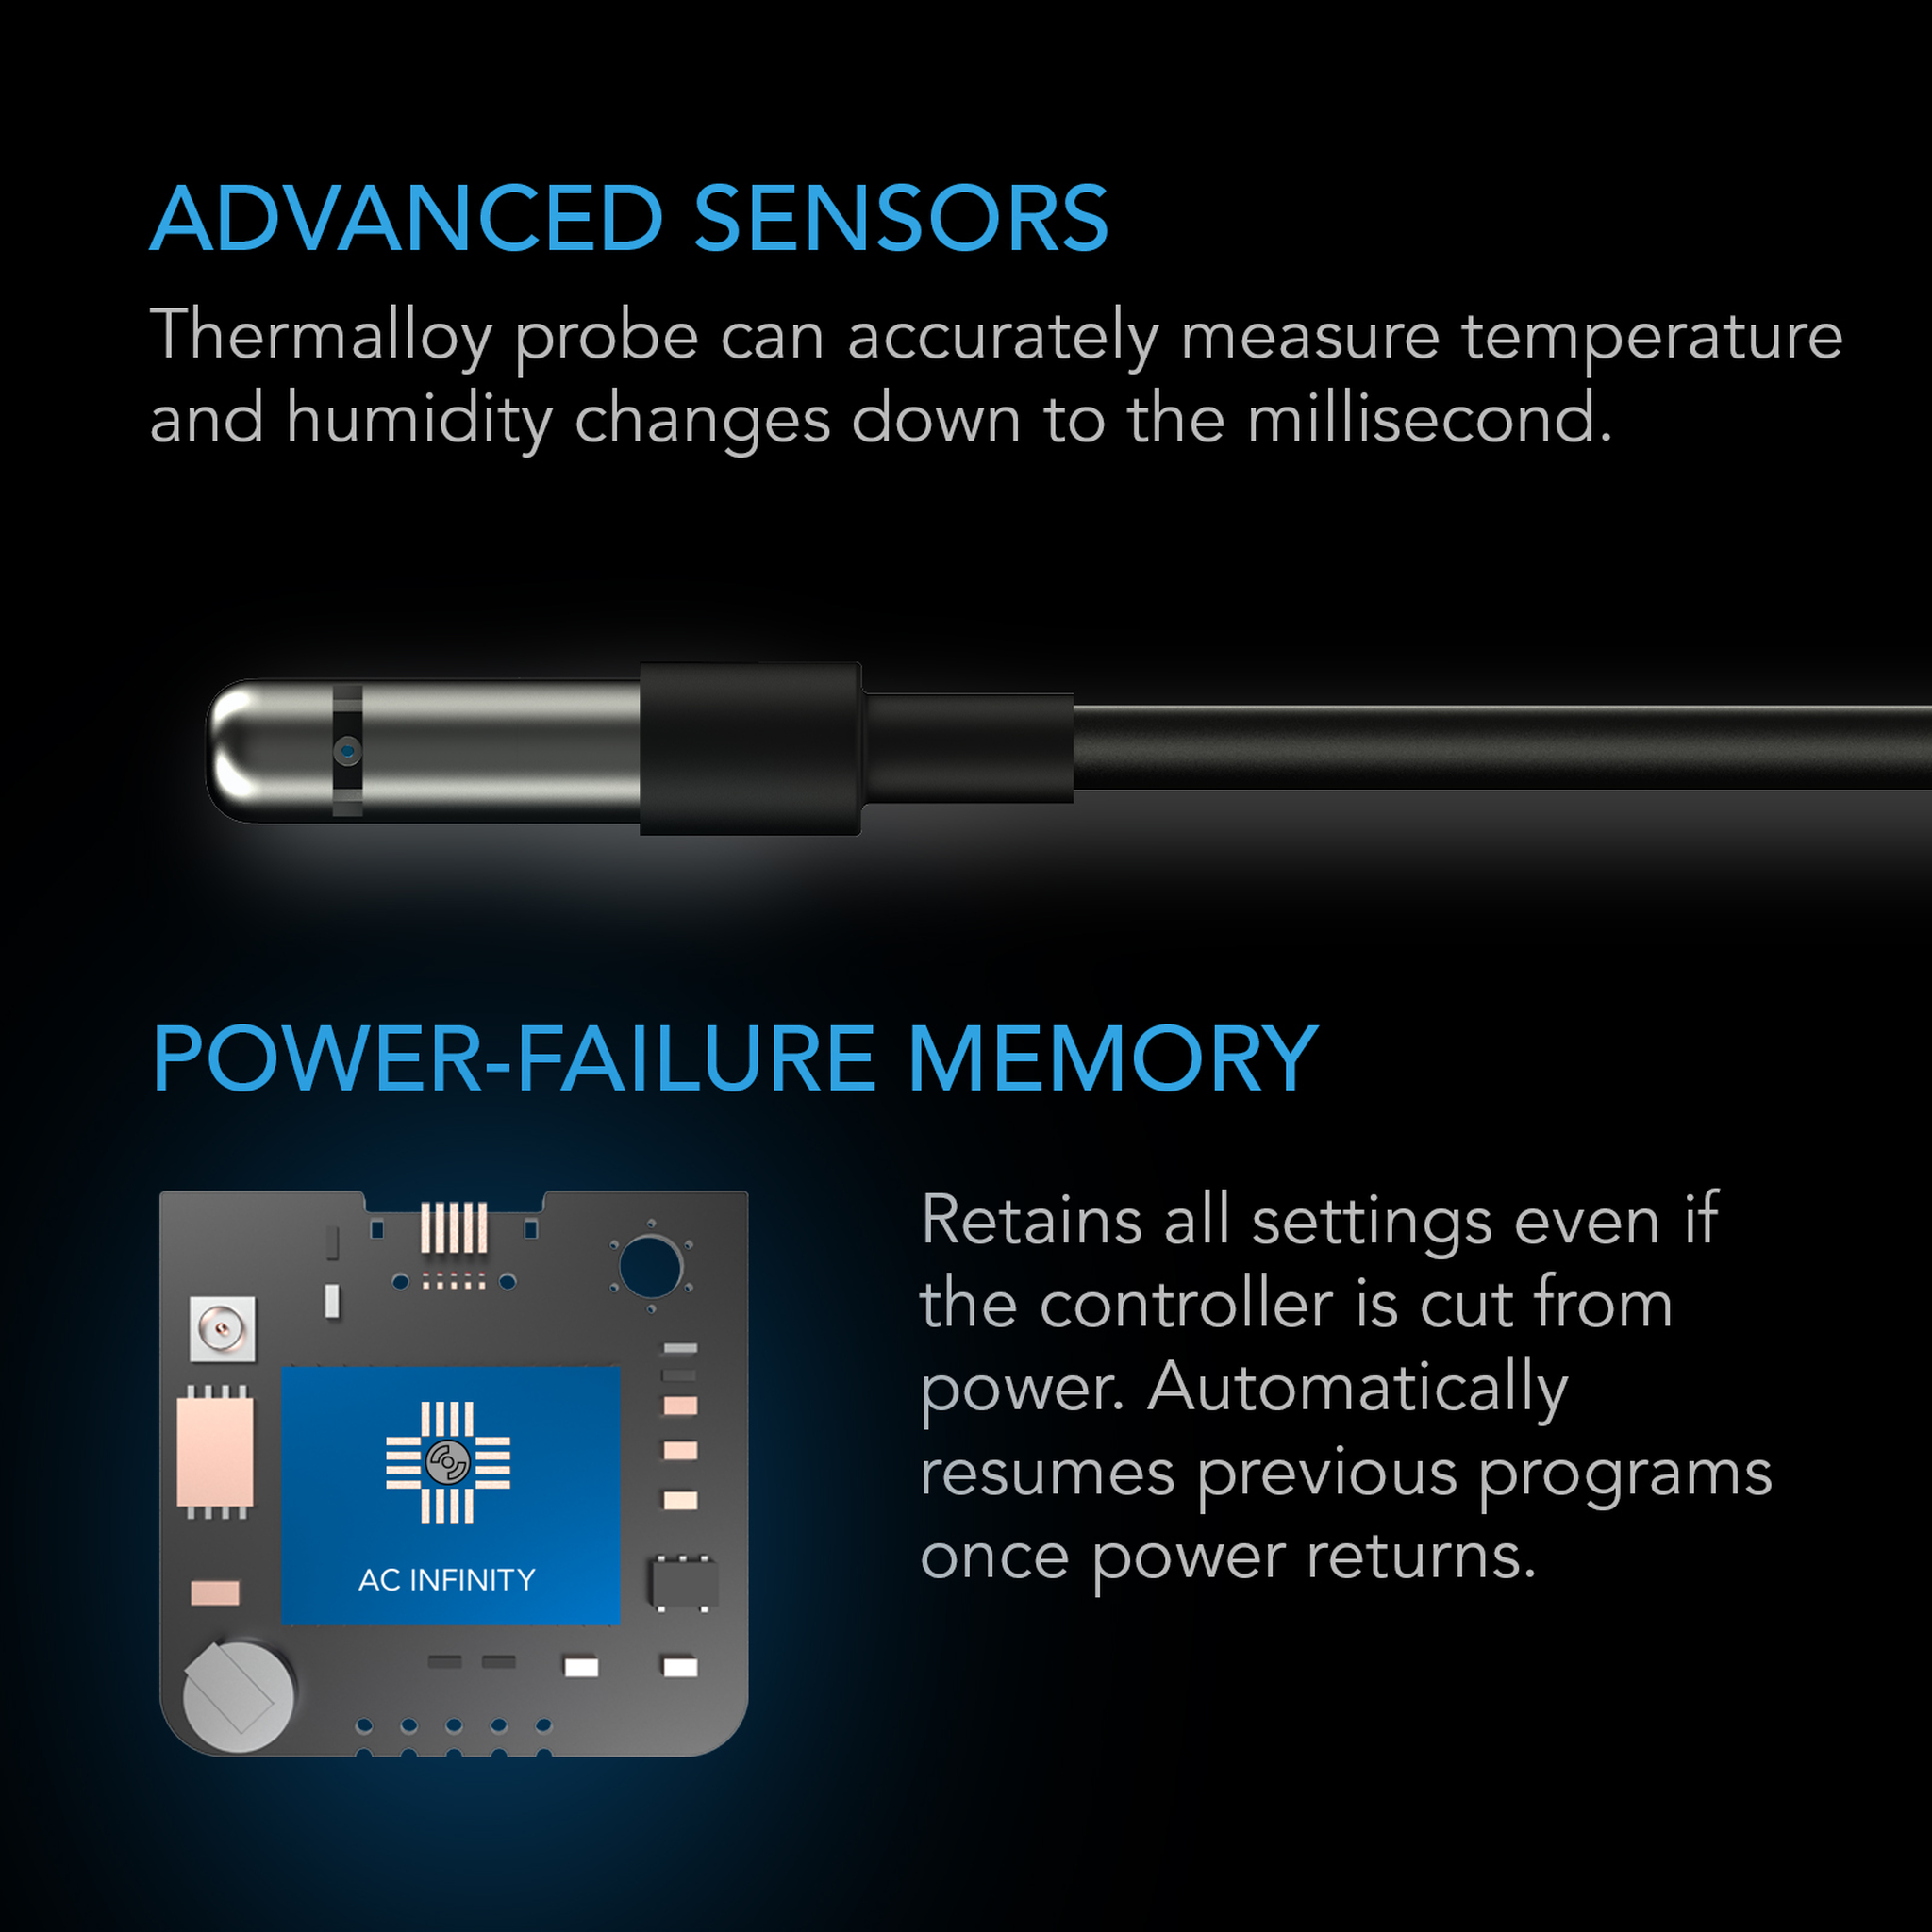 Advanced Sensors and Power-failure memory